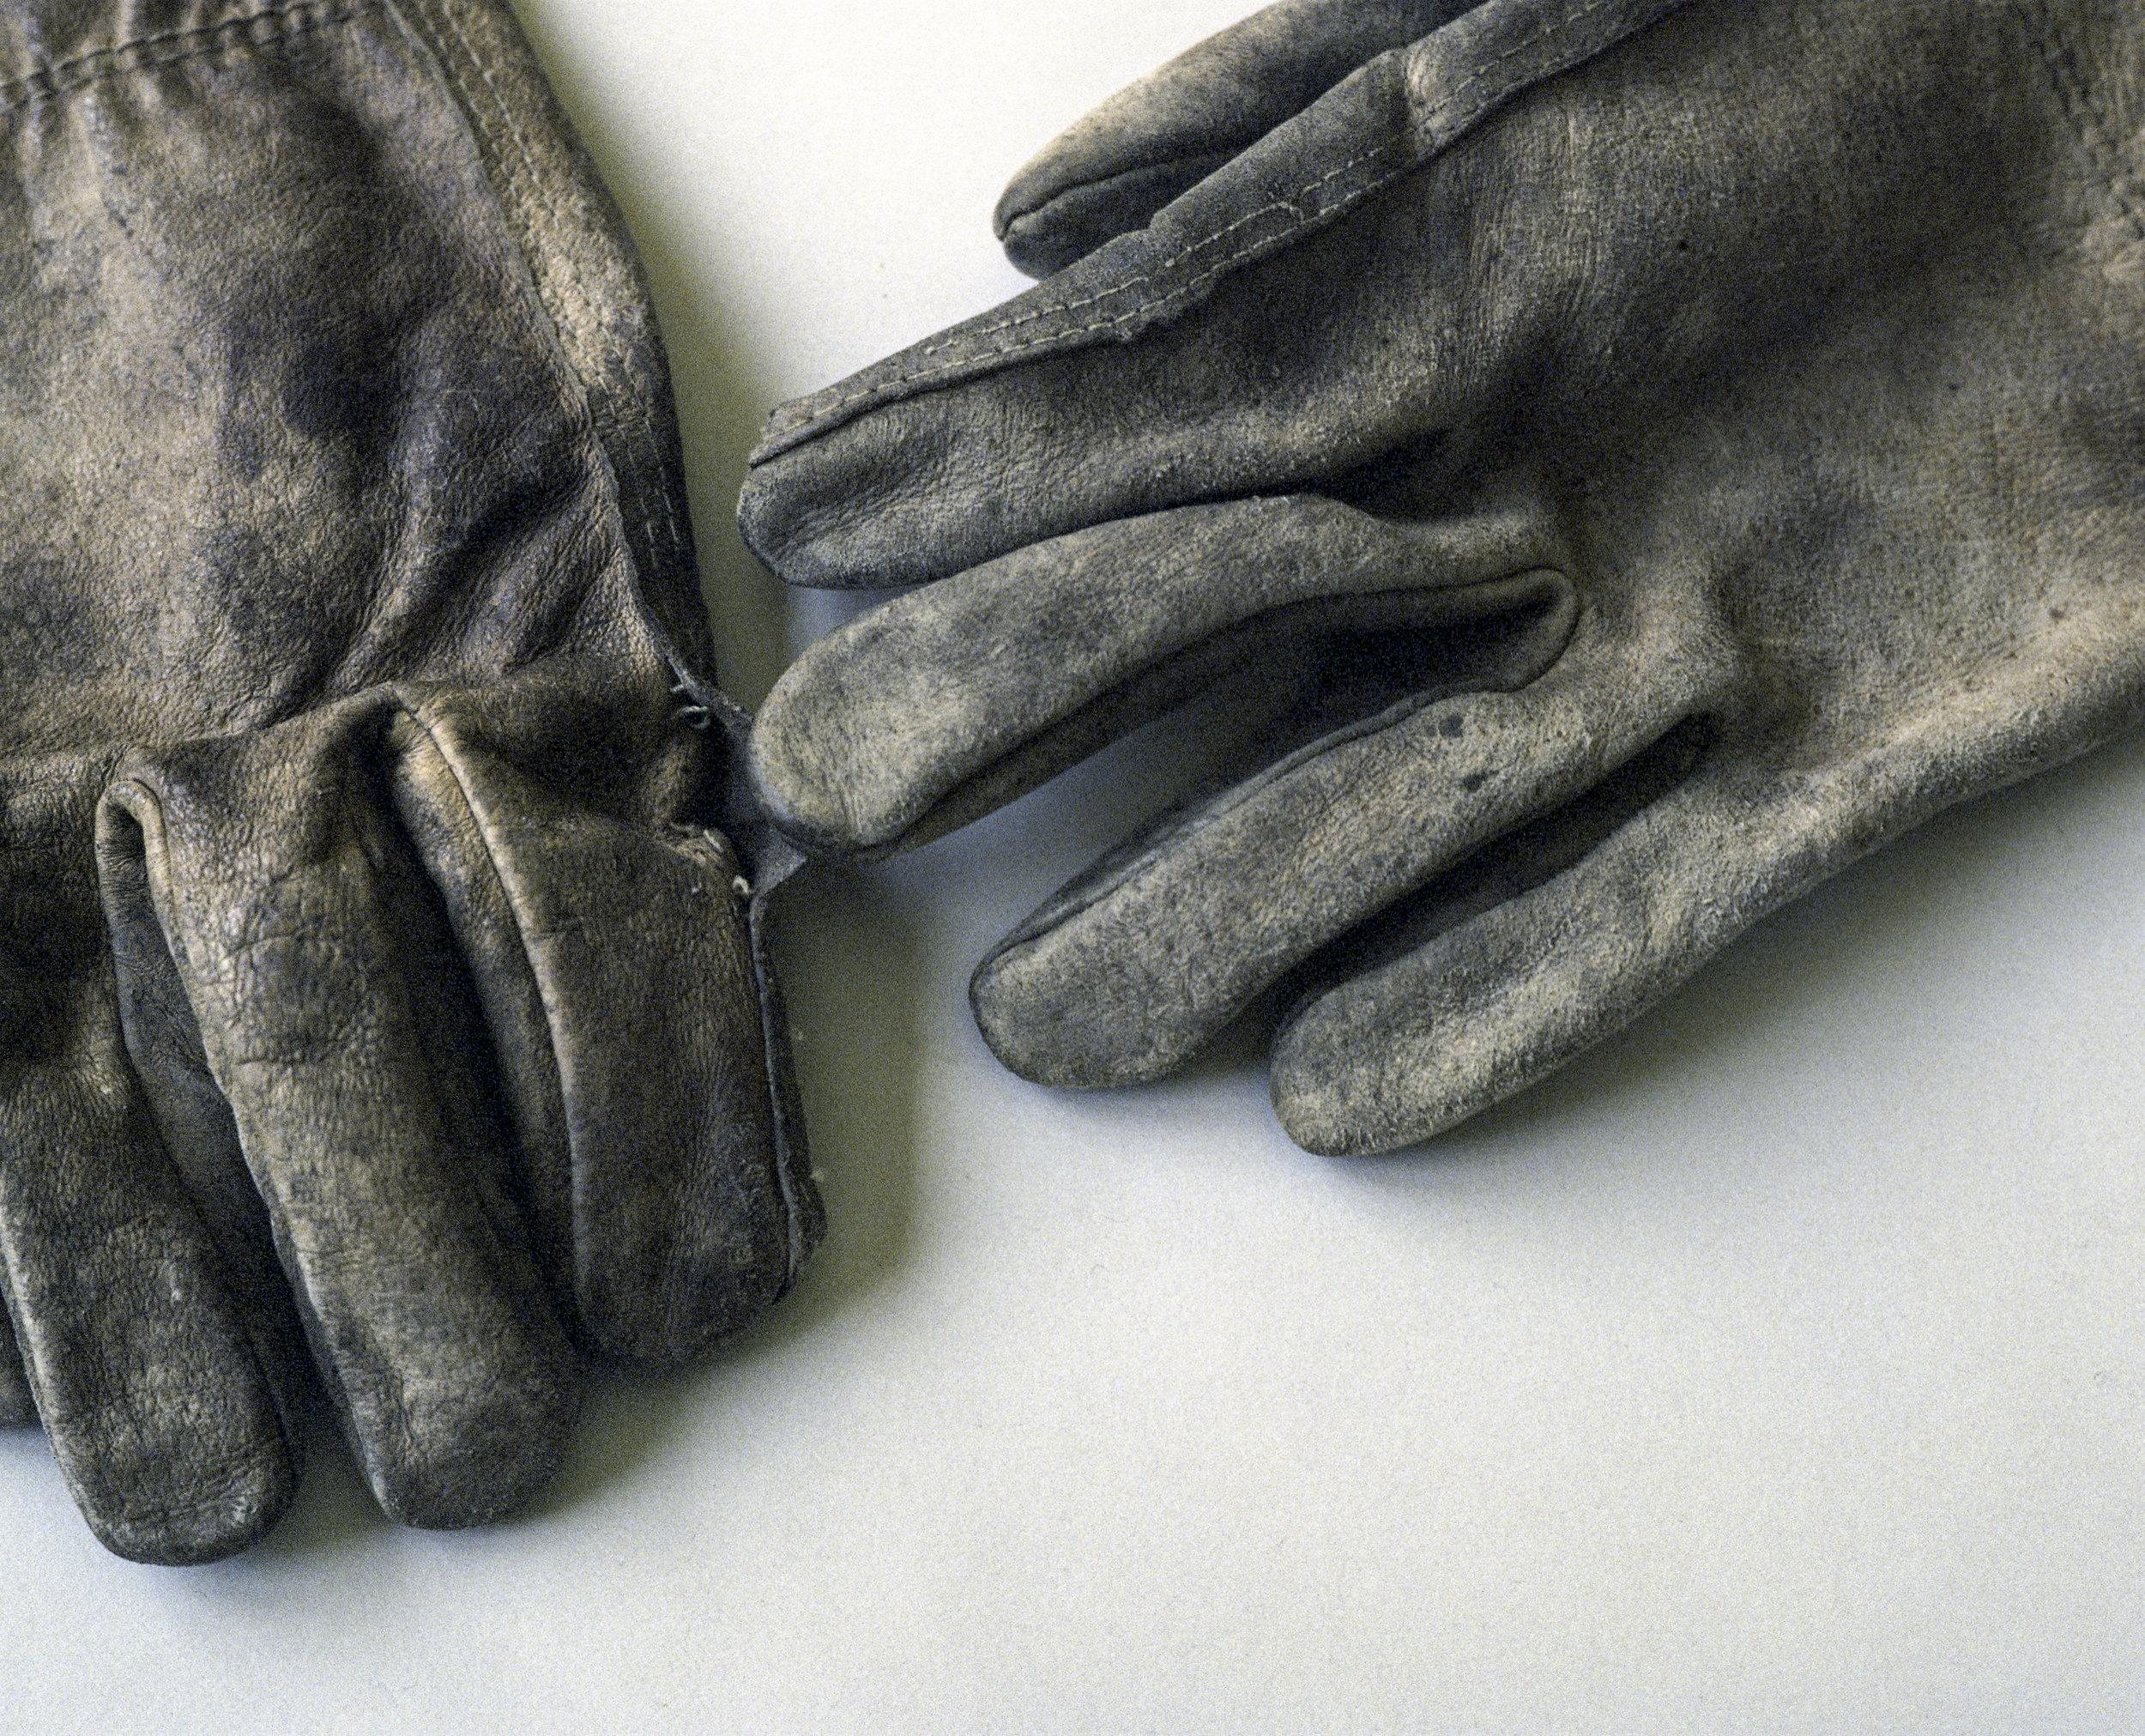 My Father's Gloves   Mamiya Press Super 23   Mamiya-Sekor 100mm f3.5 E   Kodak Ektachrome 64 (expired 1986, cross processed)   Adrian Douglas Gilliam